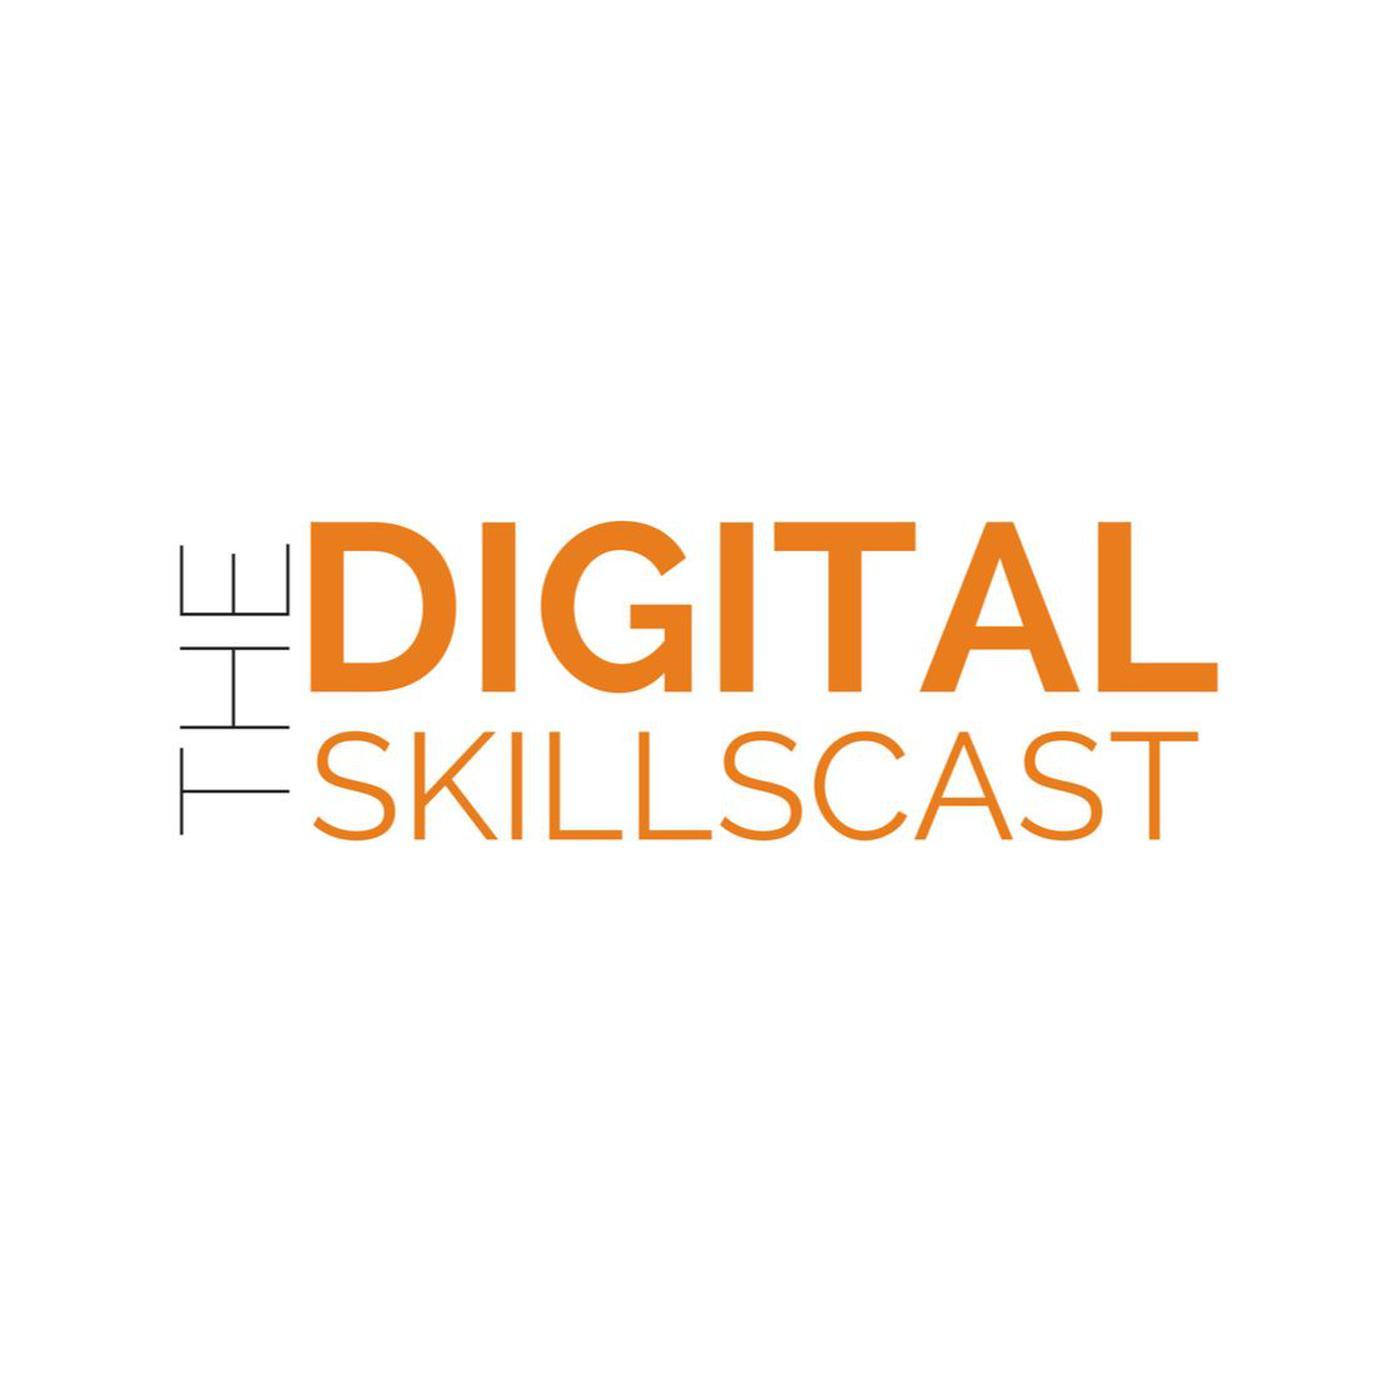 The Digital Skillscast